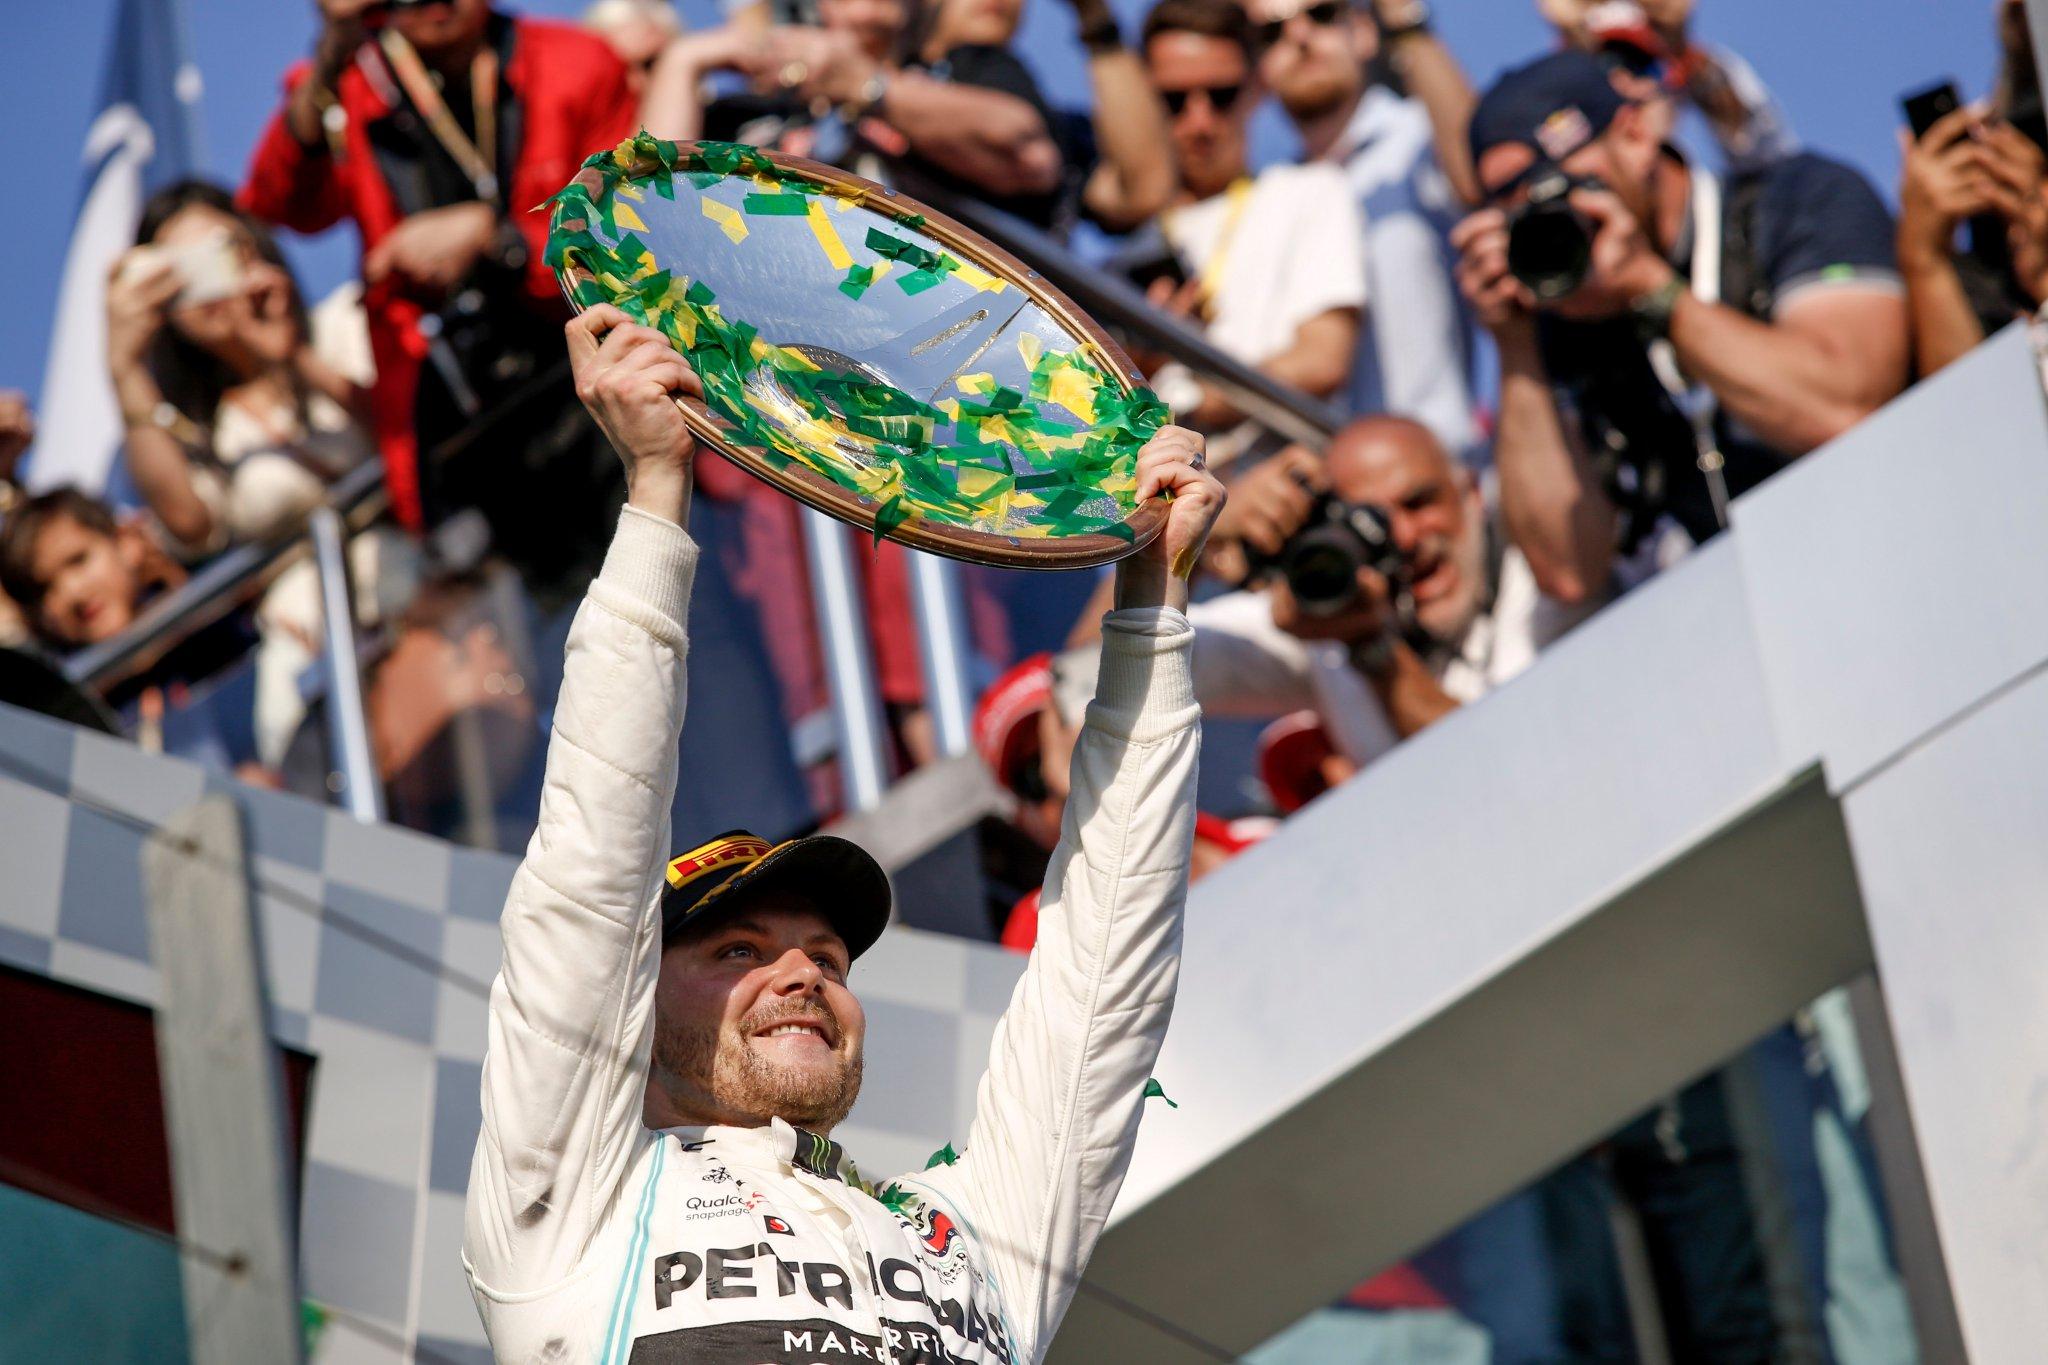 F1, Gp Australia: Bottas vince dominando, Ferrari giù dal podio - F1